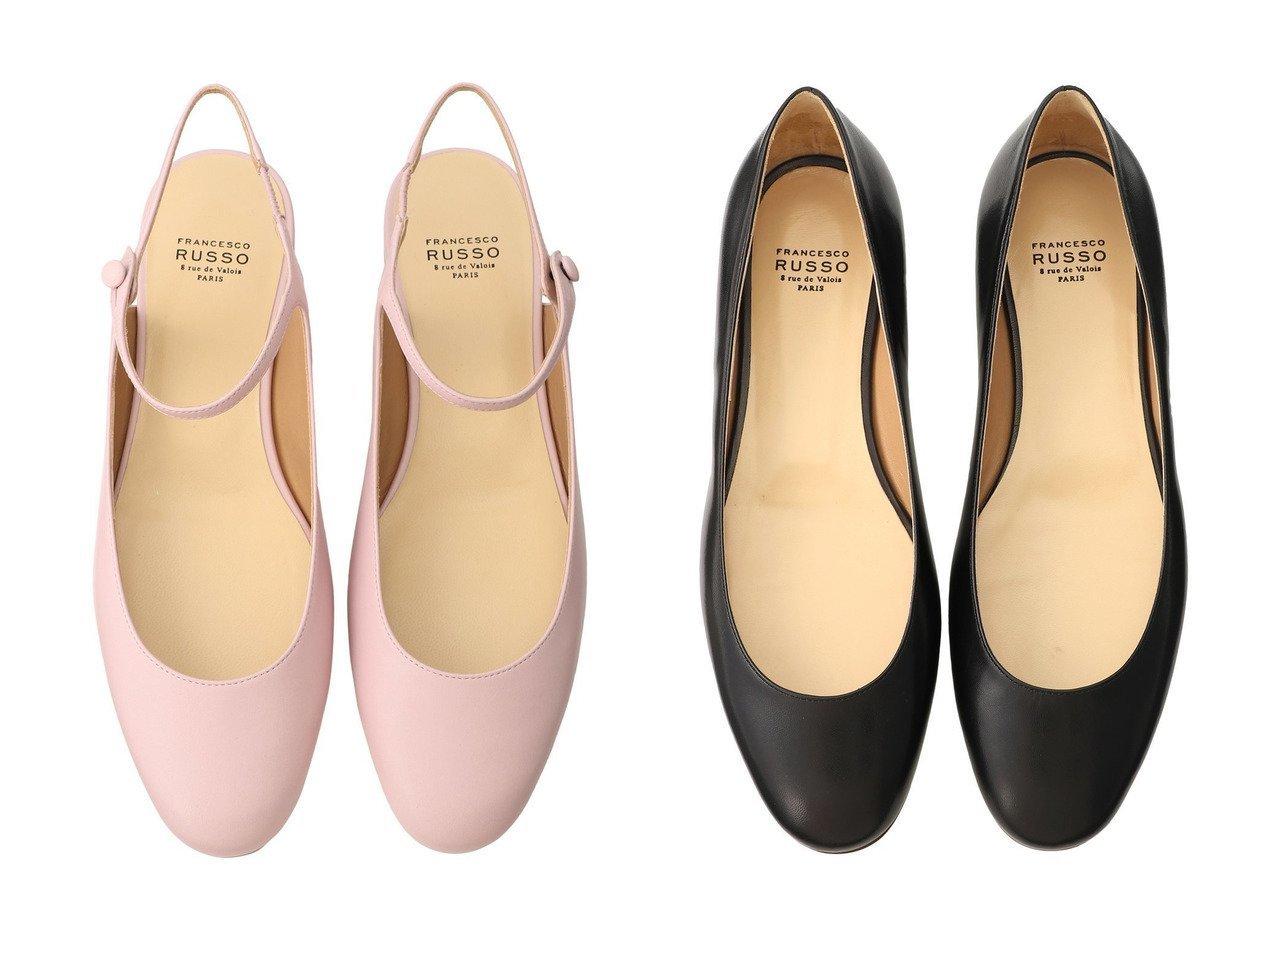 【FRANCESCO RUSSO/フランセスコルッソ 】のストラップフラットシューズ&フラットシューズ シューズ・靴のおすすめ!人気、トレンド・レディースファッションの通販 おすすめで人気の流行・トレンド、ファッションの通販商品 メンズファッション・キッズファッション・インテリア・家具・レディースファッション・服の通販 founy(ファニー) https://founy.com/ ファッション Fashion レディースファッション WOMEN 2021年 2021 2021 春夏 S/S SS Spring/Summer 2021 S/S 春夏 SS Spring/Summer サンダル シェイプ シューズ ソックス フェミニン フラット ラップ 春 Spring |ID:crp329100000015317